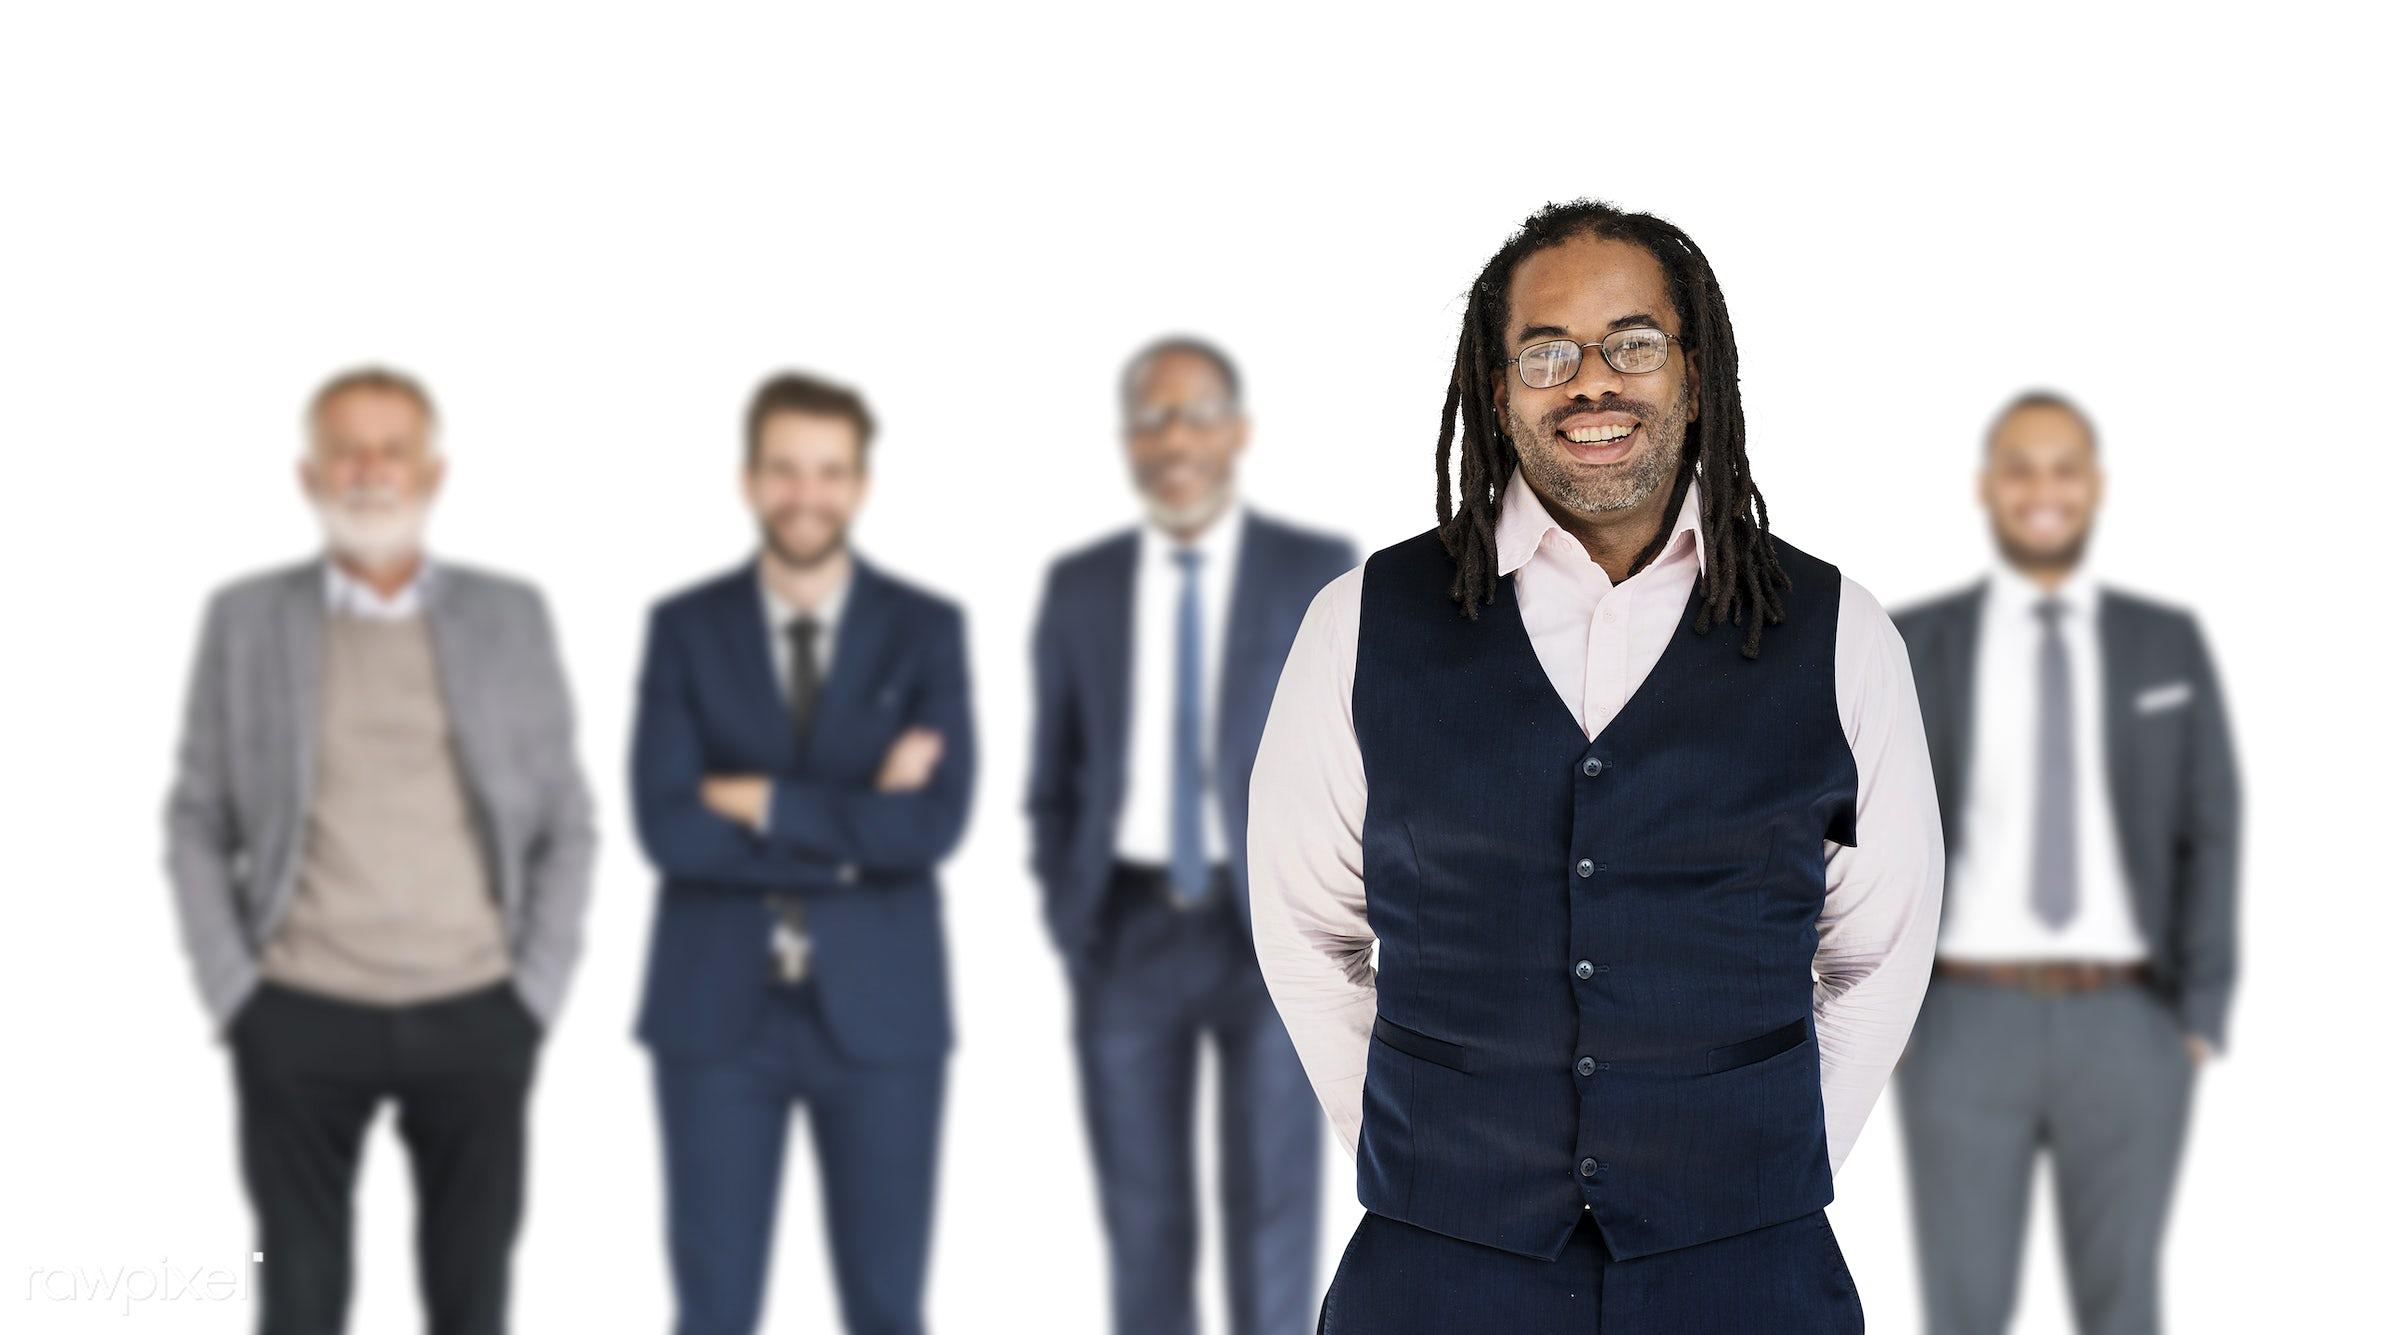 studio, manager, diverse, profession, people, caucasian, teamwork, assistant, lifestyle, studio squareset, occupation,...